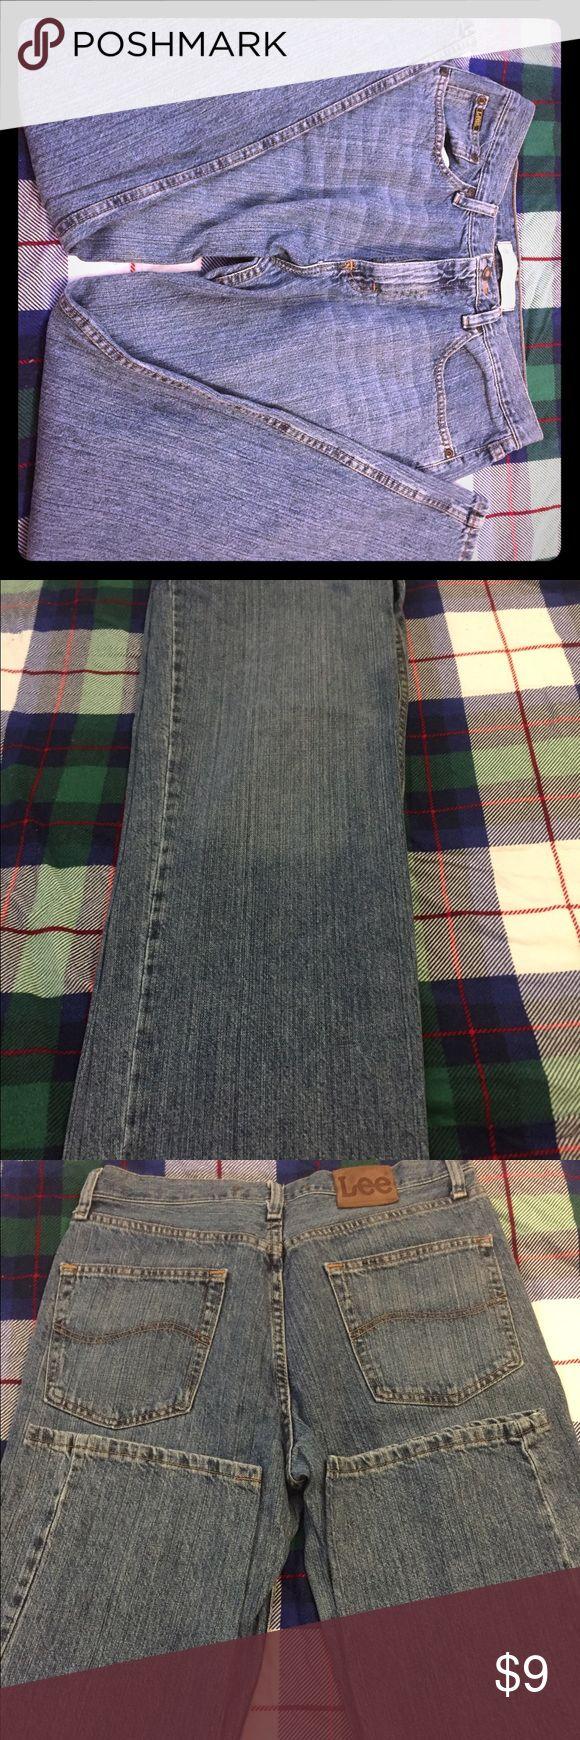 Men's Lee Jeans 33x30 medium wash Rlx/str. Leg Relaxed, straight leg men's Lee Jeans 33x30 medium wash. Excellent condition! Lee Jeans Straight Leg